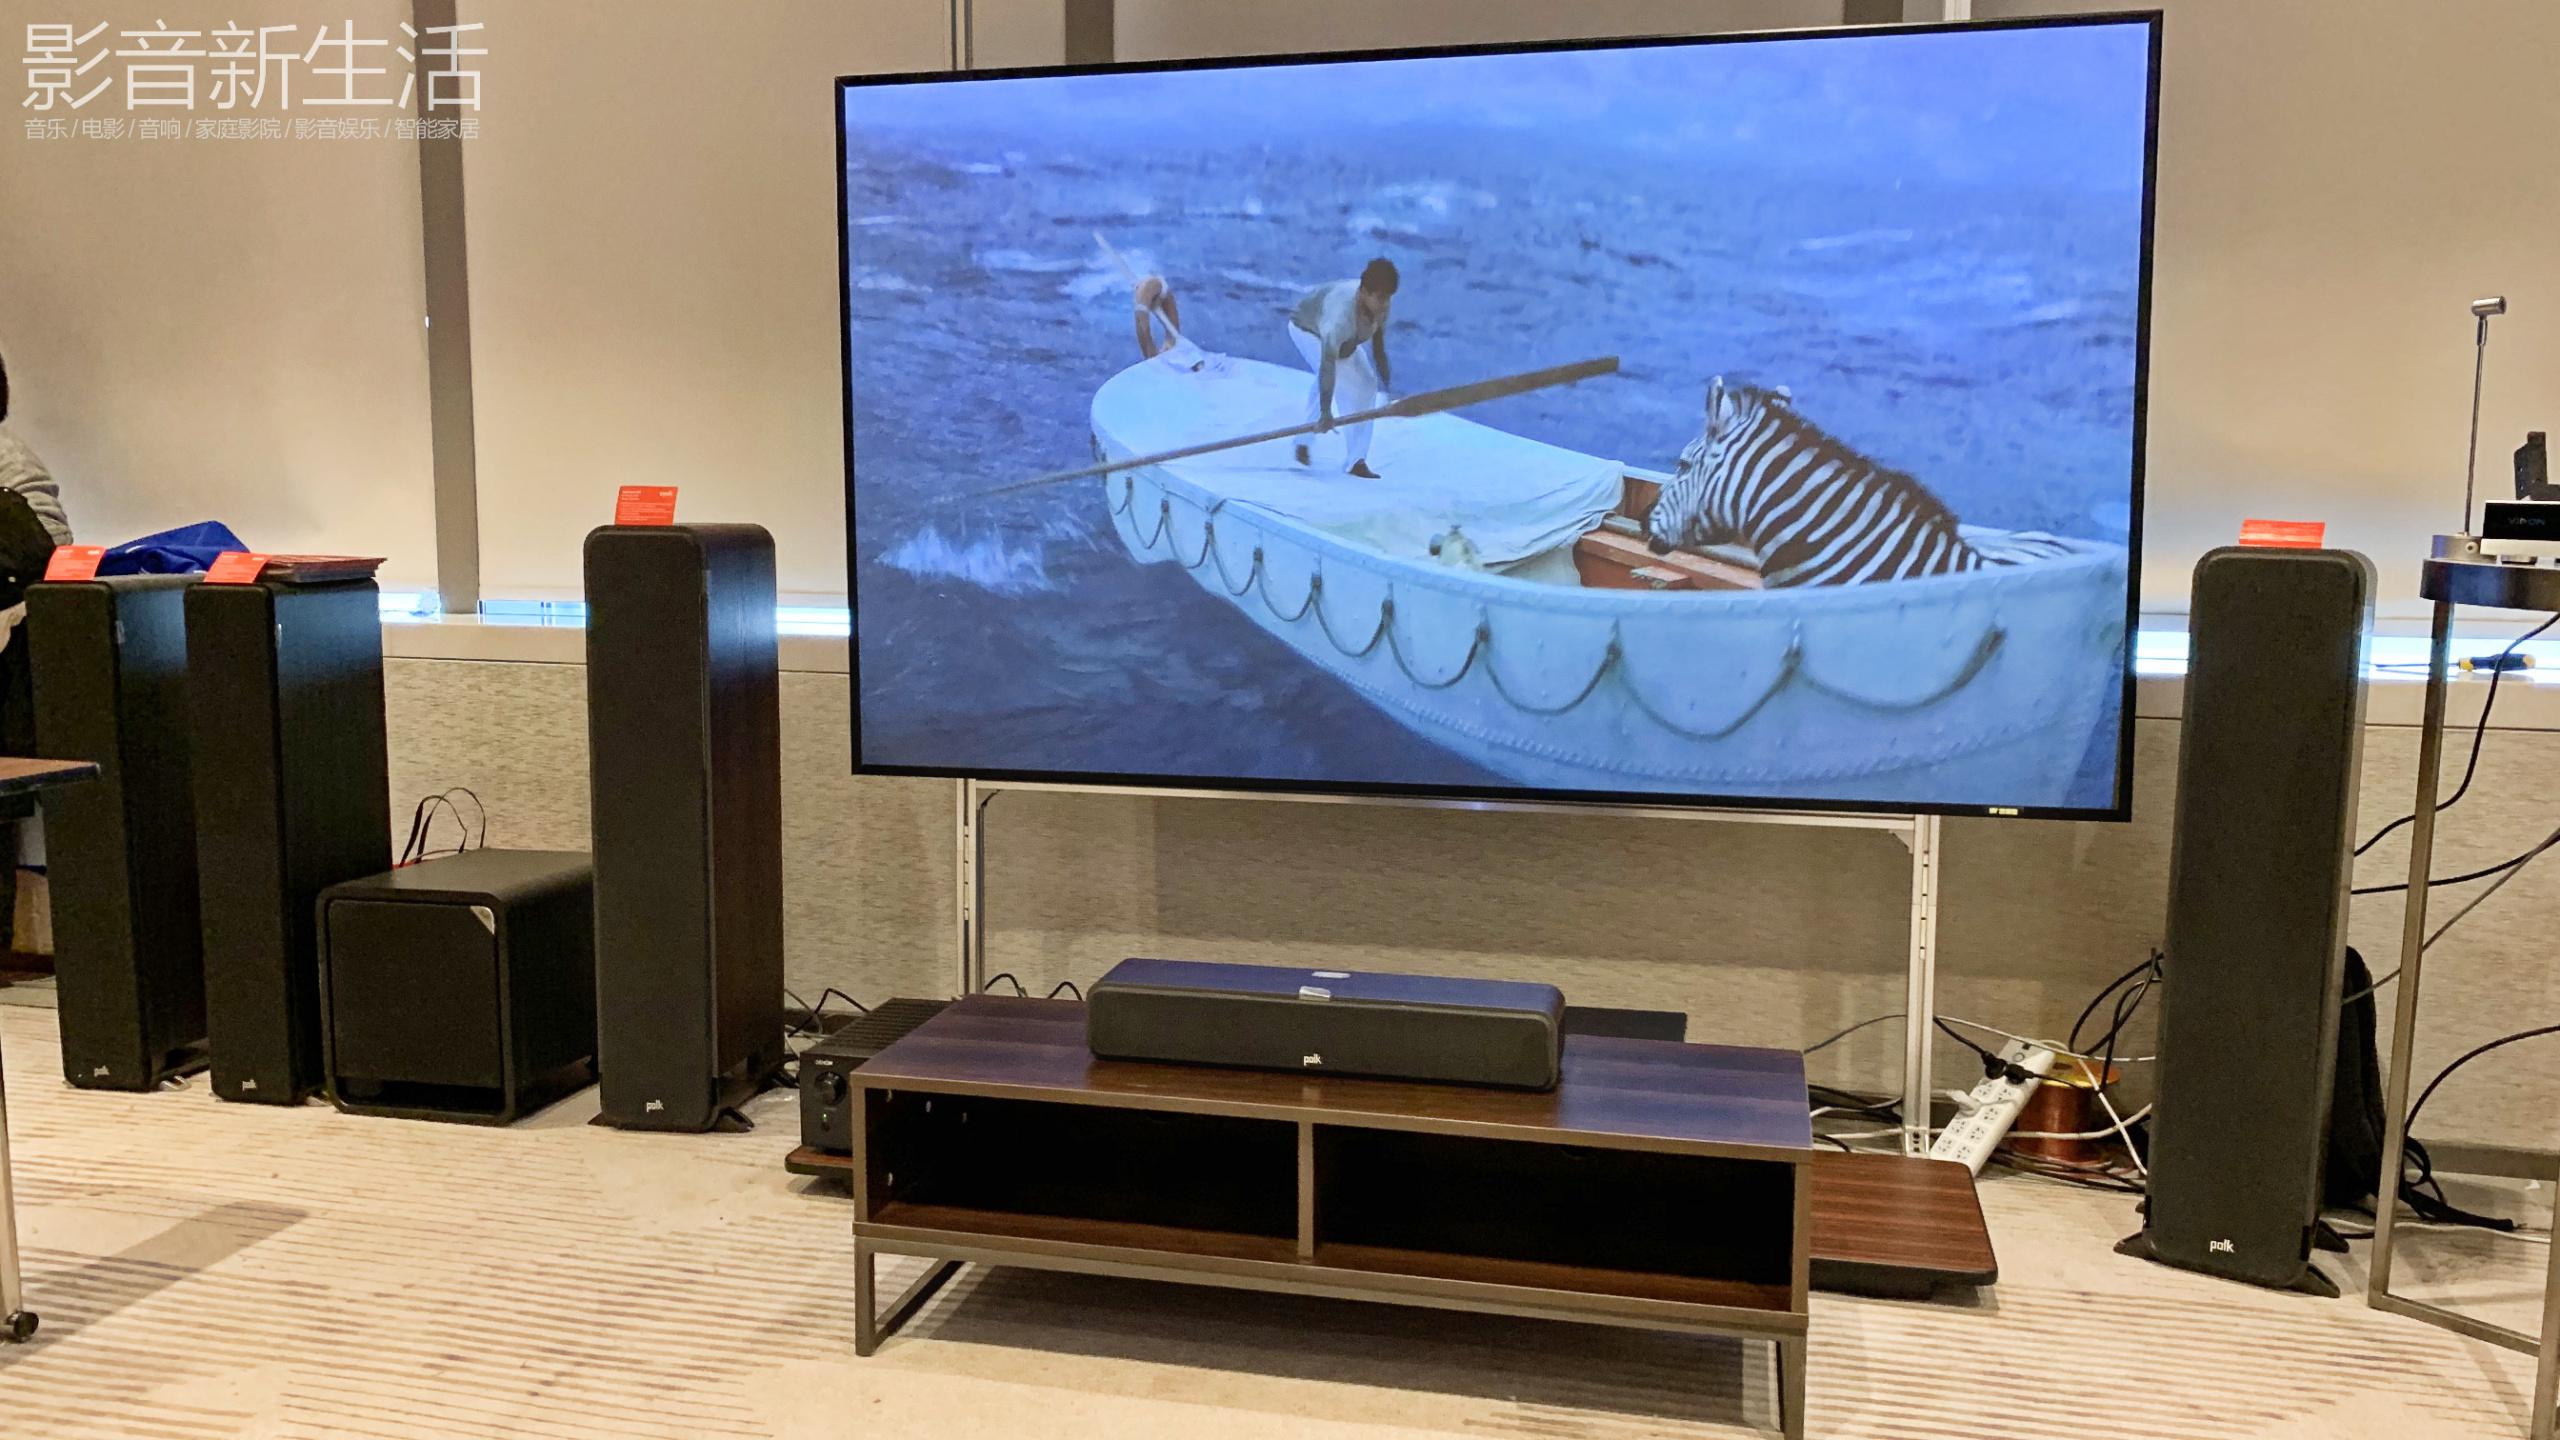 "VIDON V20 UHD HDR 9 - 发布 | ""2019 UHD 超高清影音播放新高度"" VIDON 威动 V20 智能影库发布!"